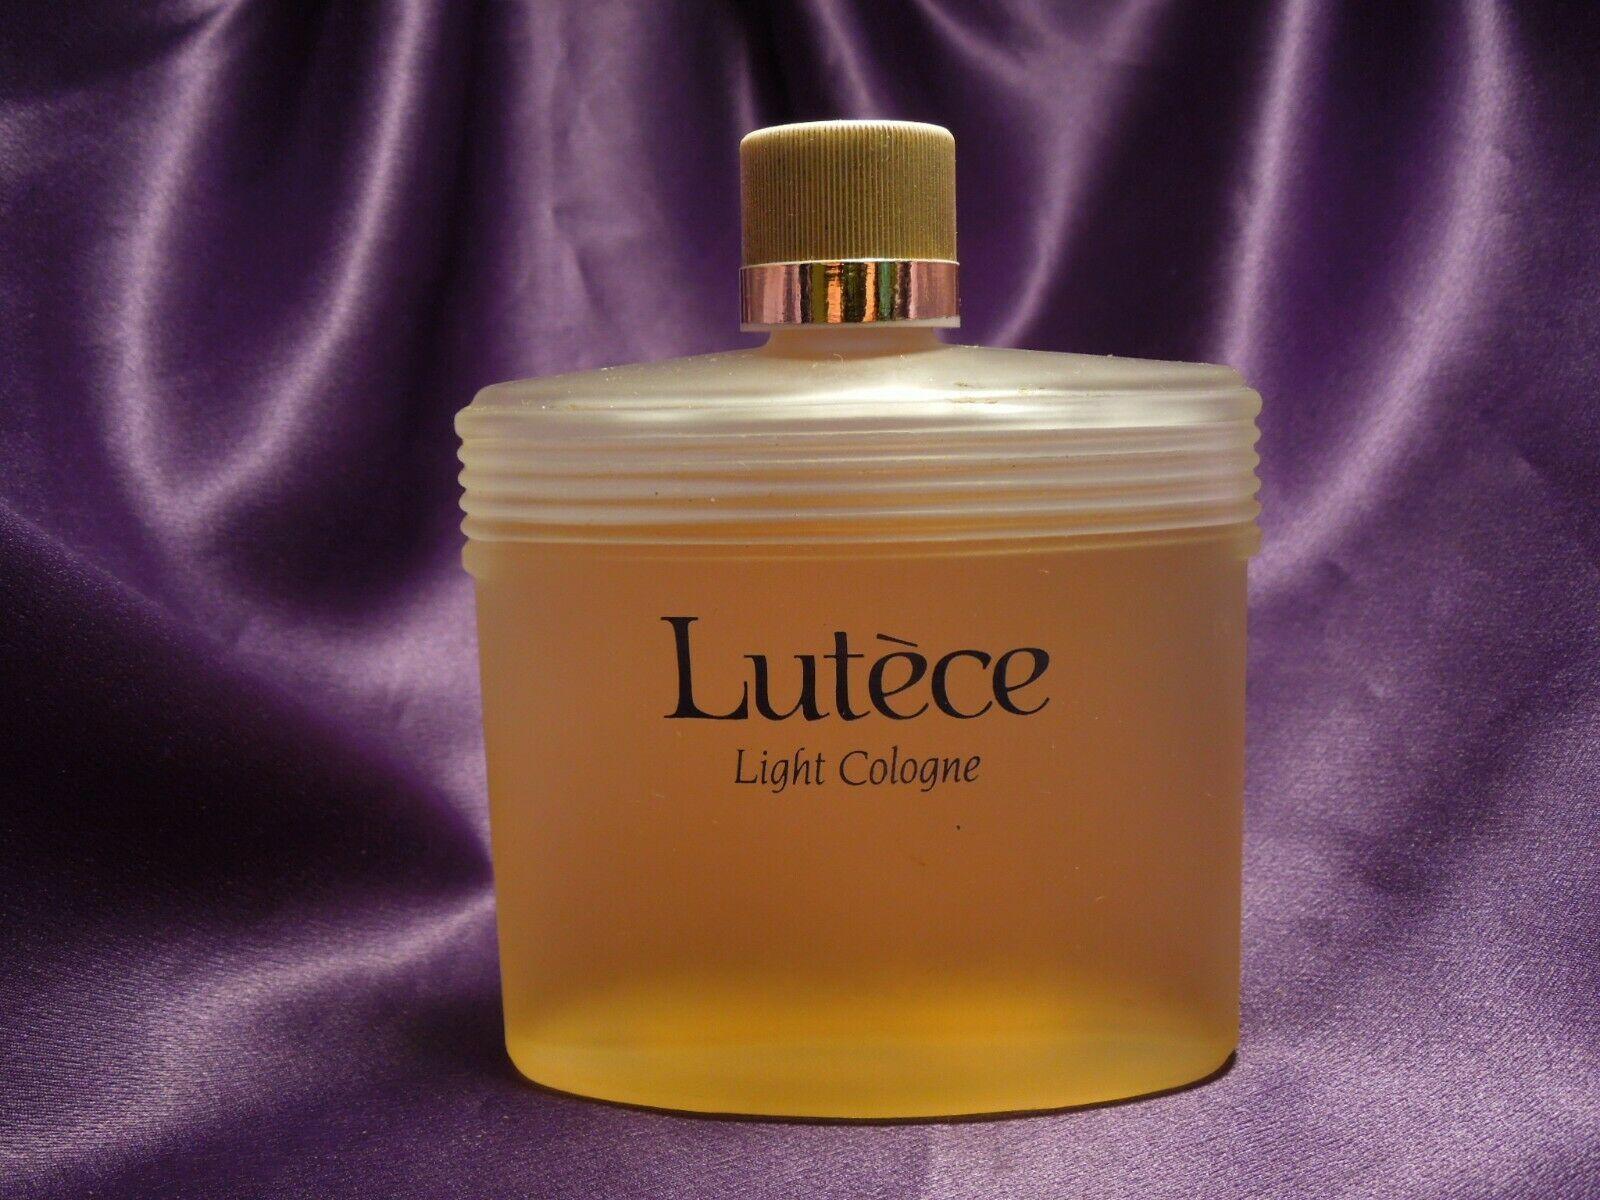 Lutece Light Cologne 5.25fl oz Size Bottle - $34.65